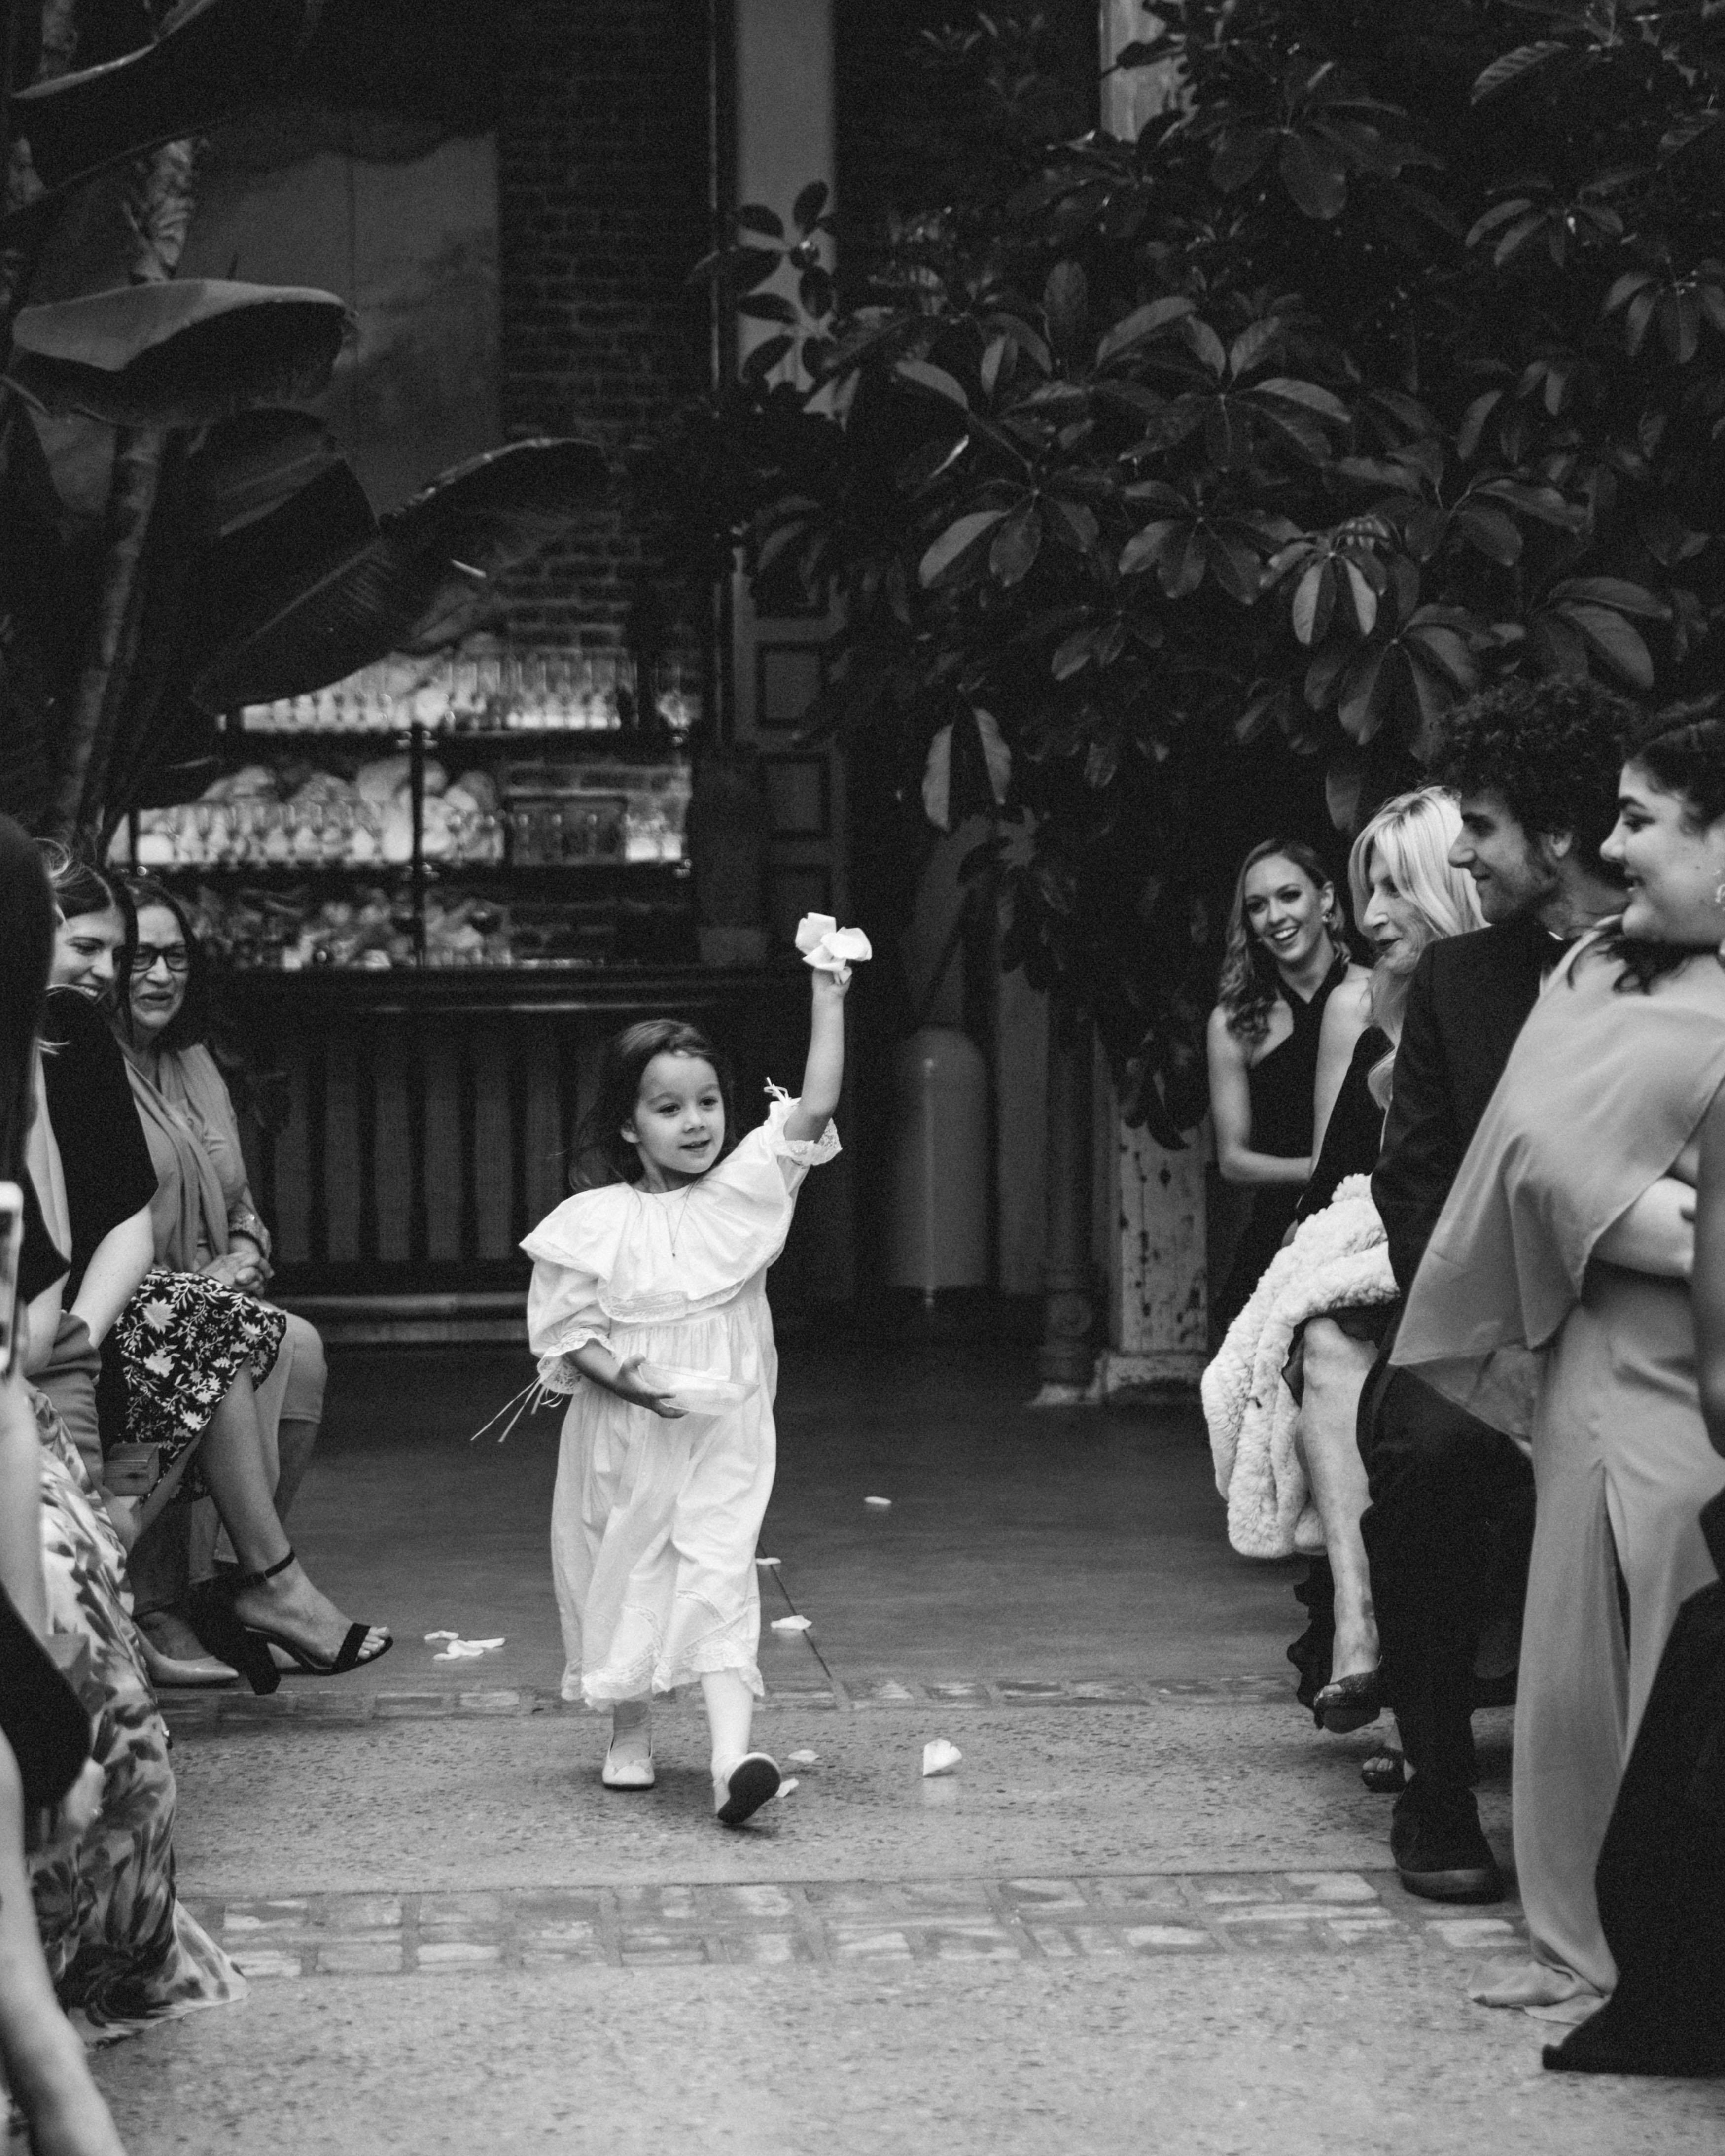 wedding flowergirl walking down aisle black and white